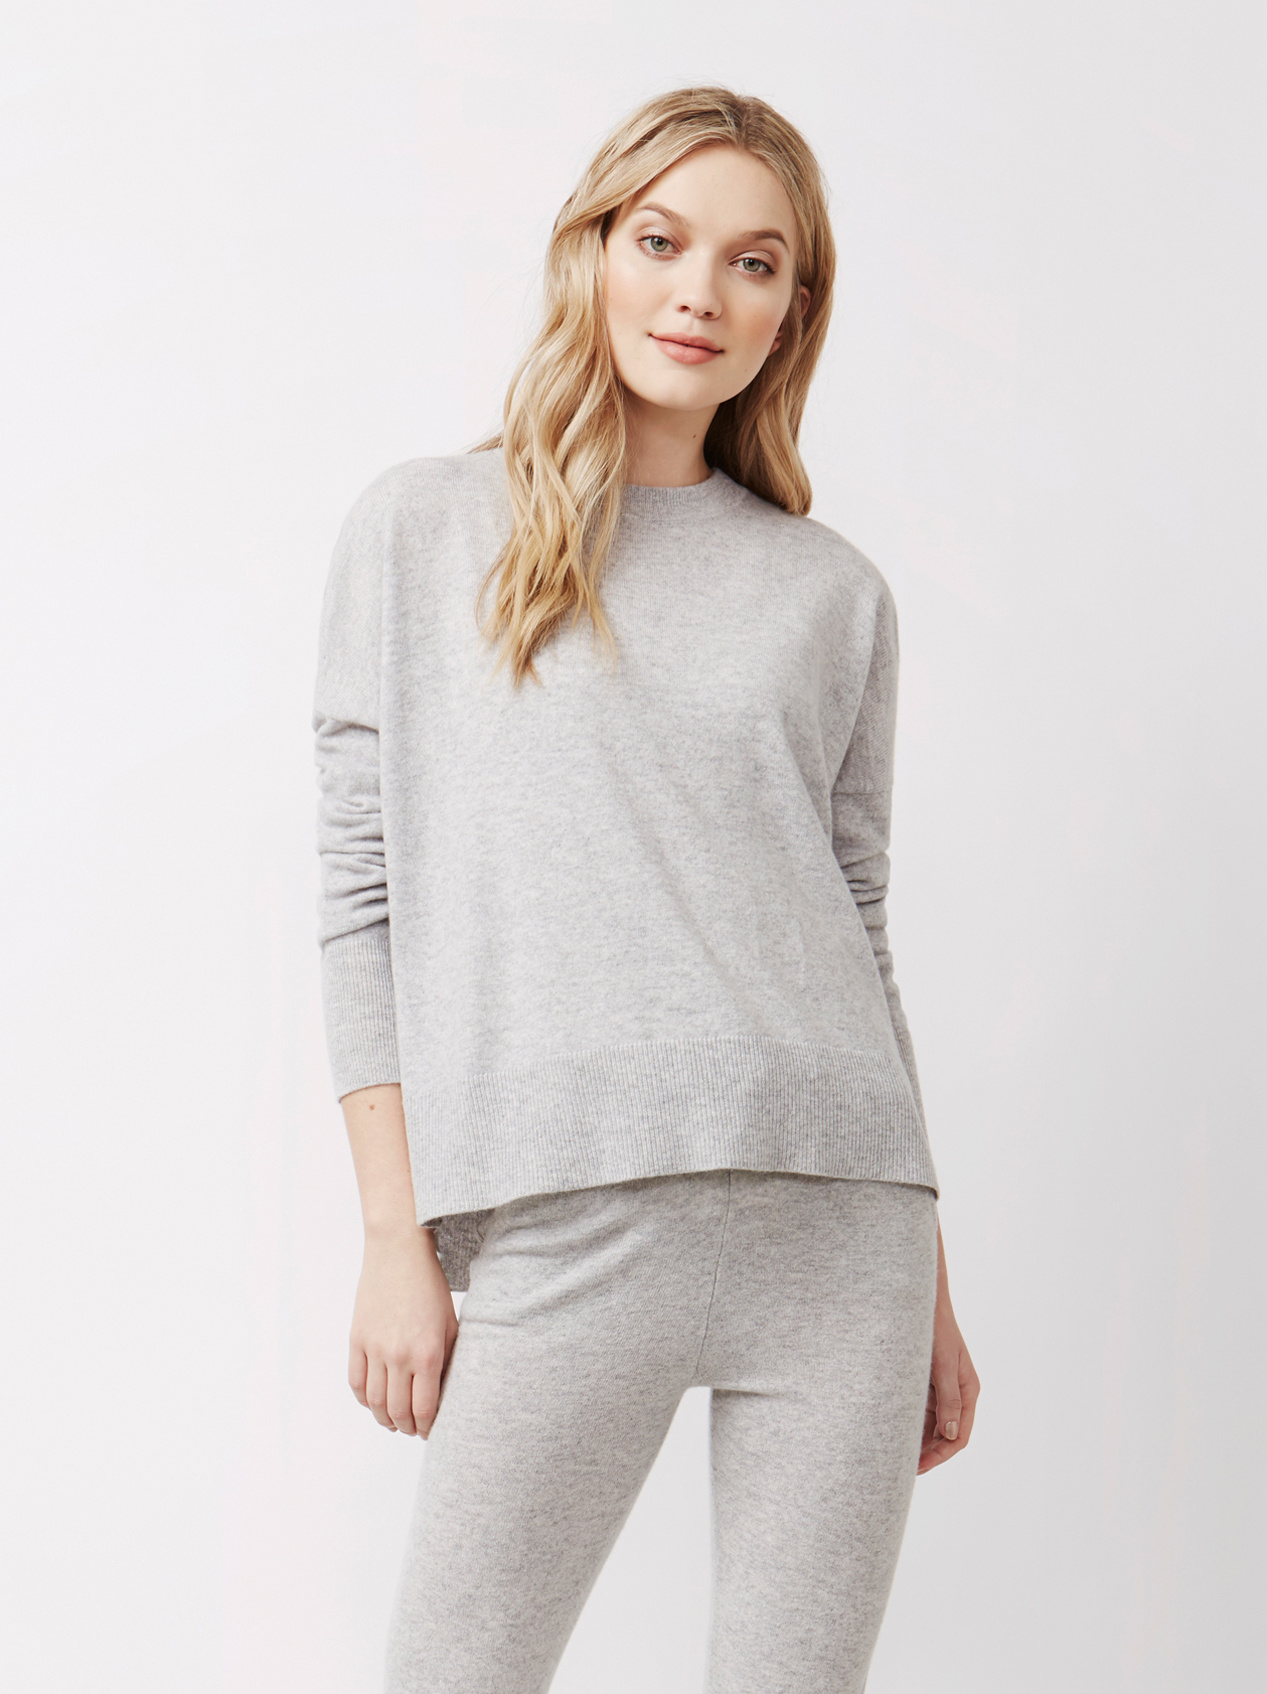 Soft Goat Women's Boyfriend Sweater Light Grey